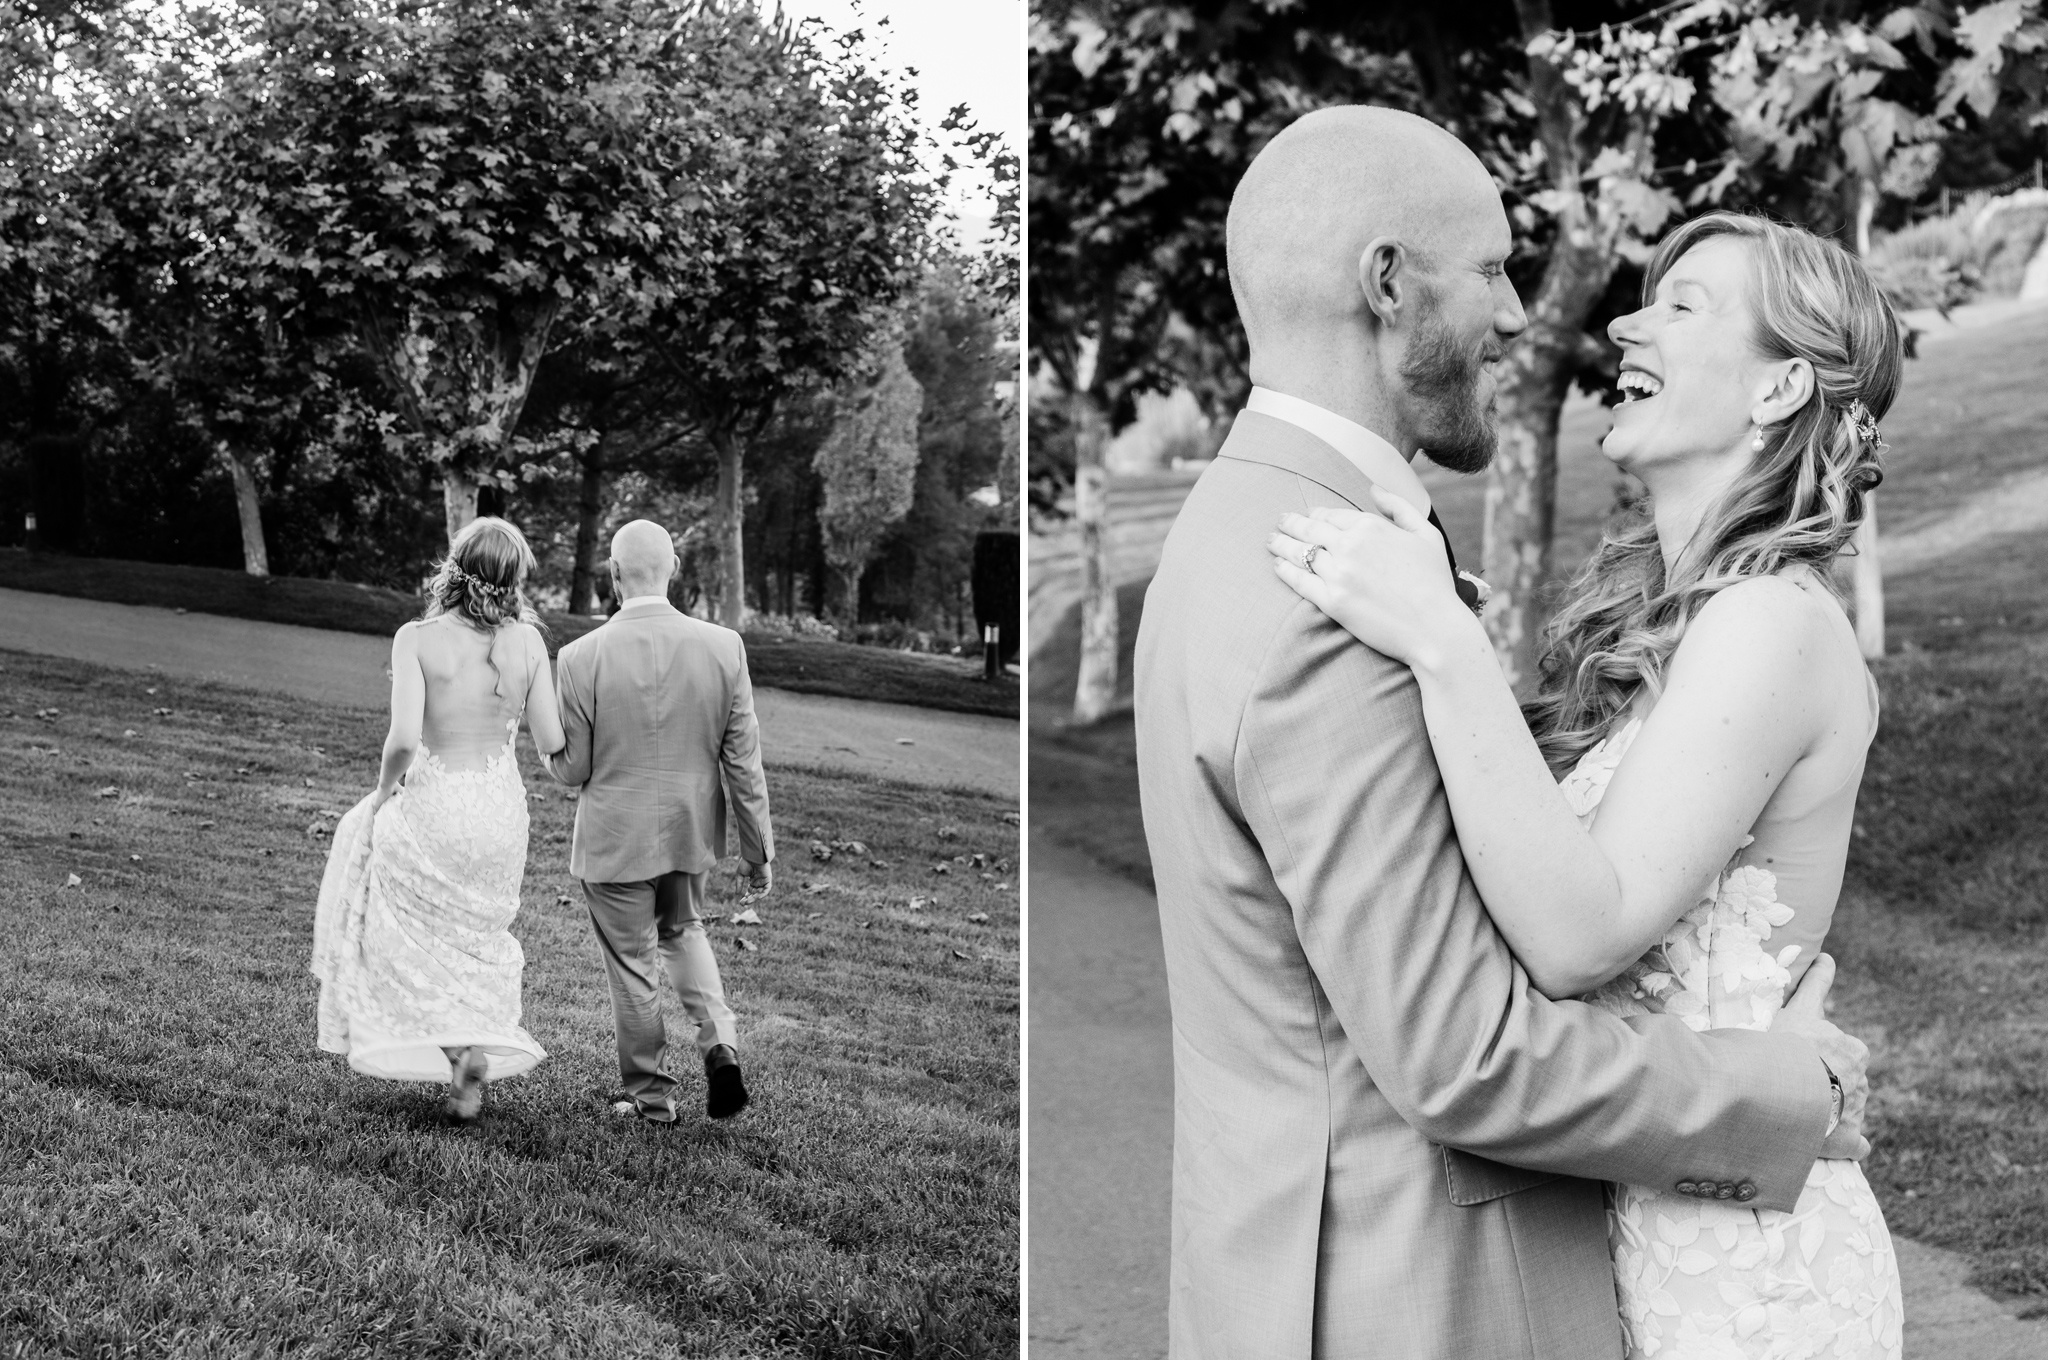 fotografia-boda-mas-sant-llei0058.jpg